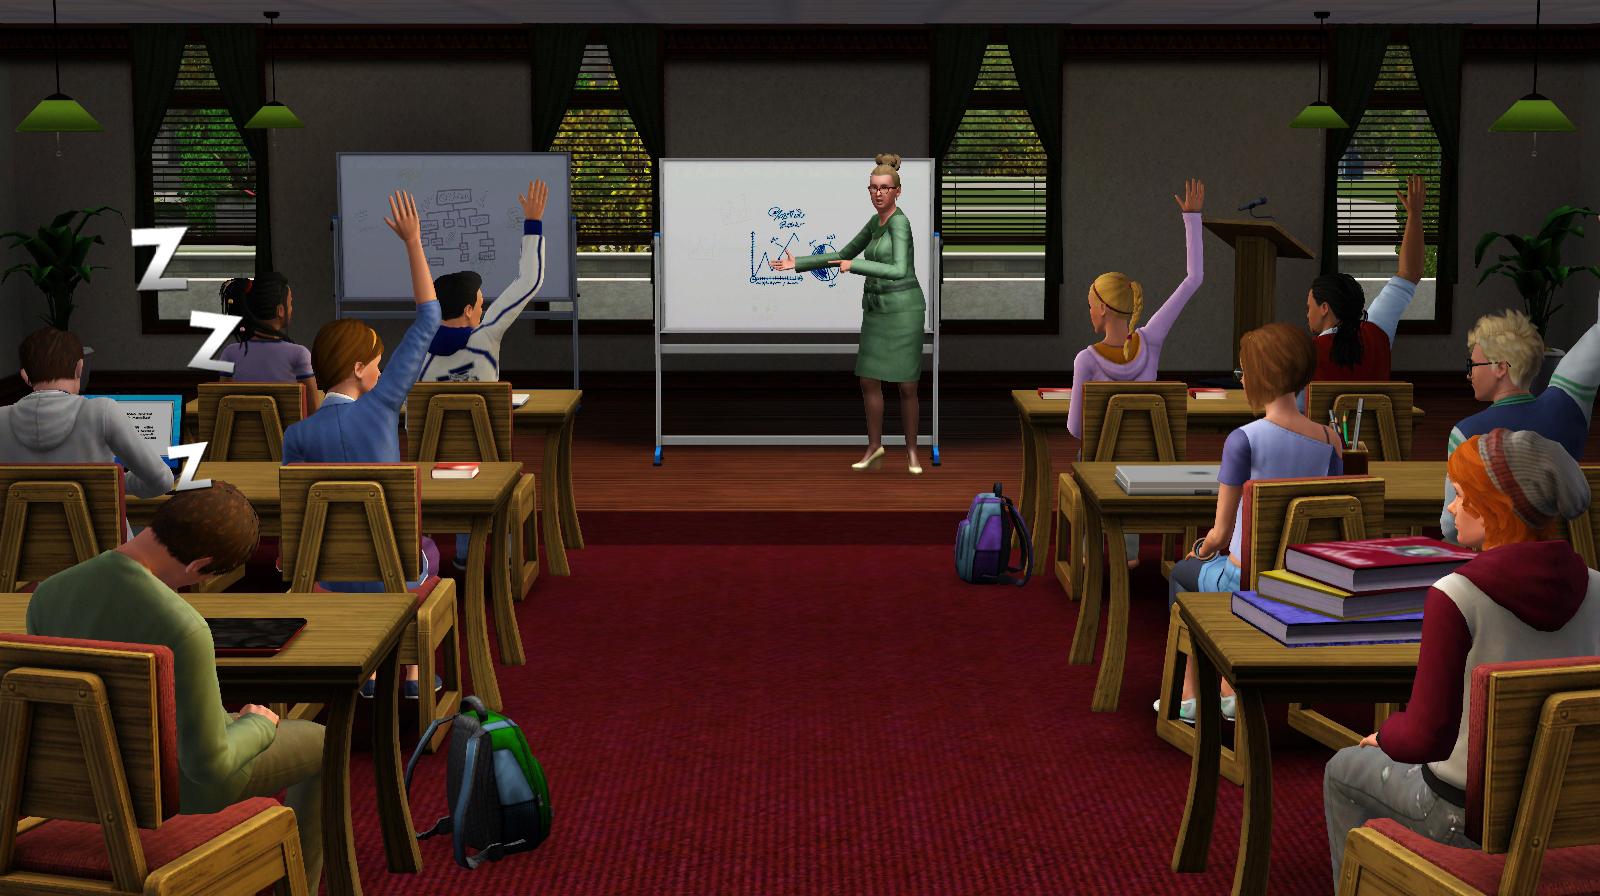 ts3_universitylife_classroom_zzz